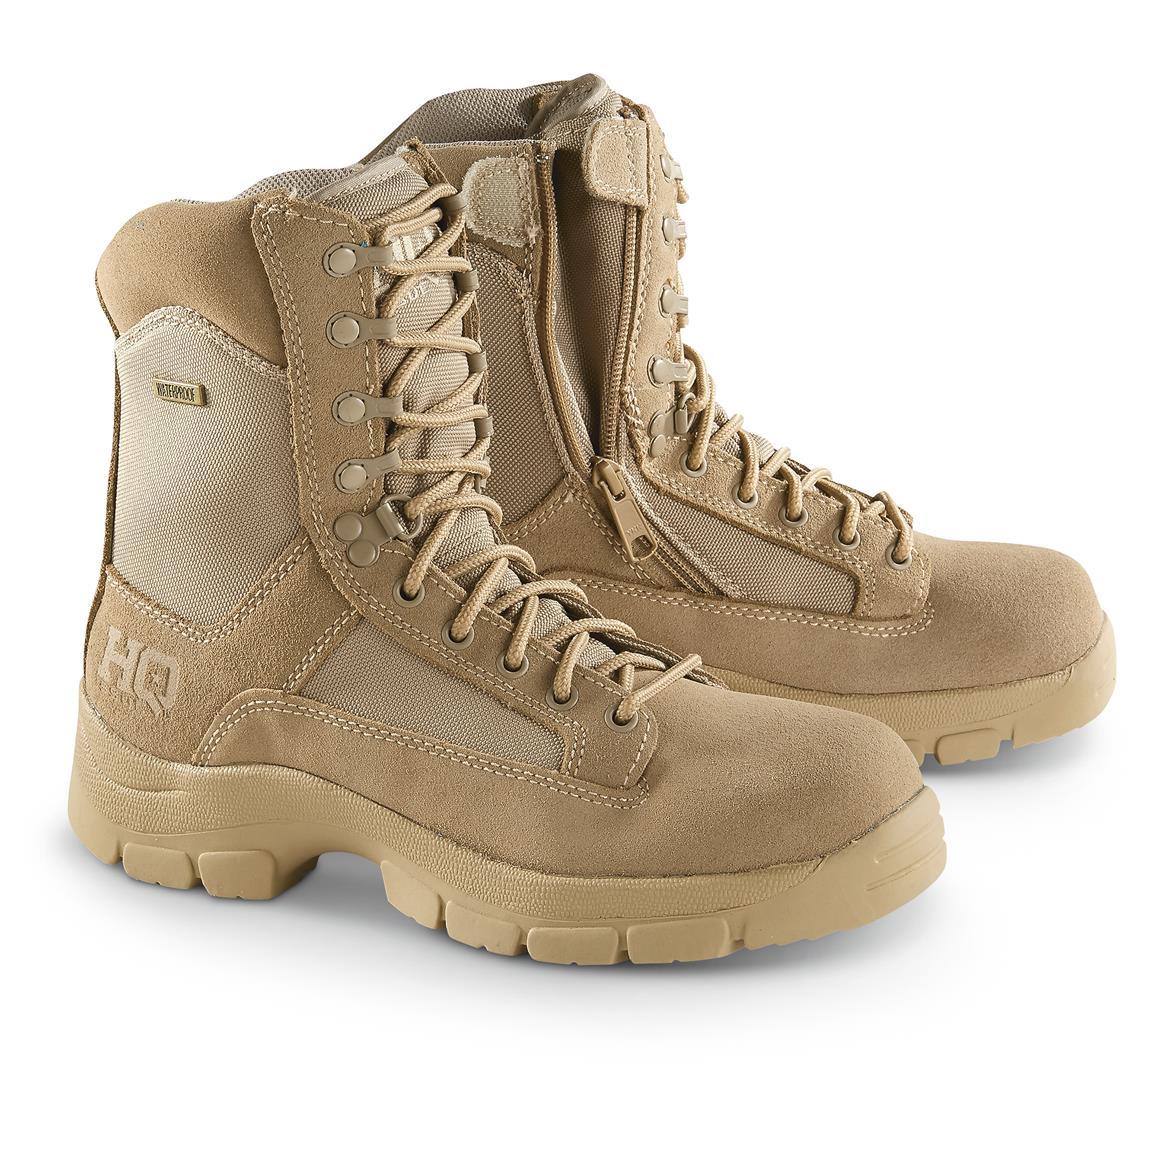 desert boots hq issue menu0027s waterproof 8 mnjlvhp